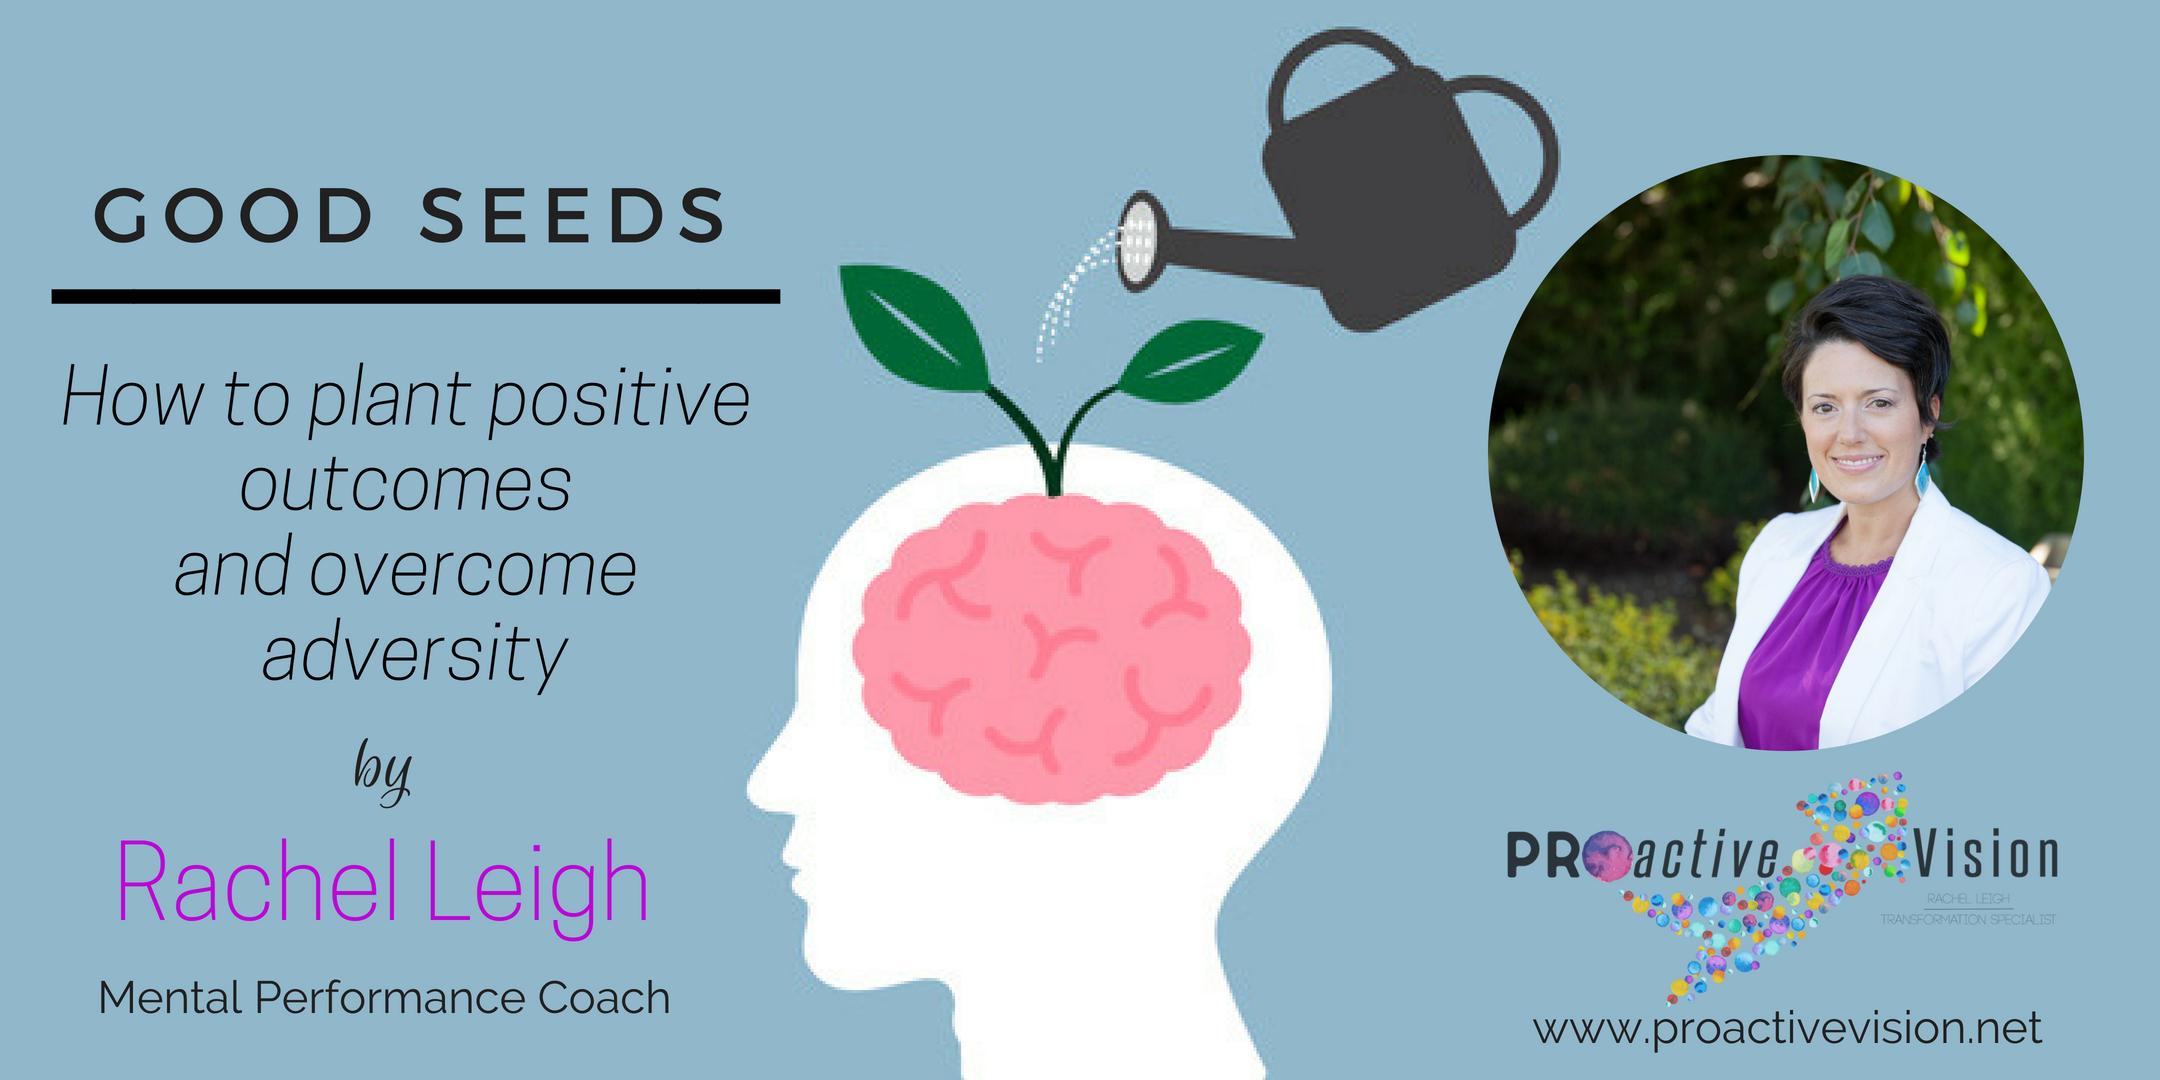 Rachel Leigh, positive outcomes, overcome adversity, proactive vision